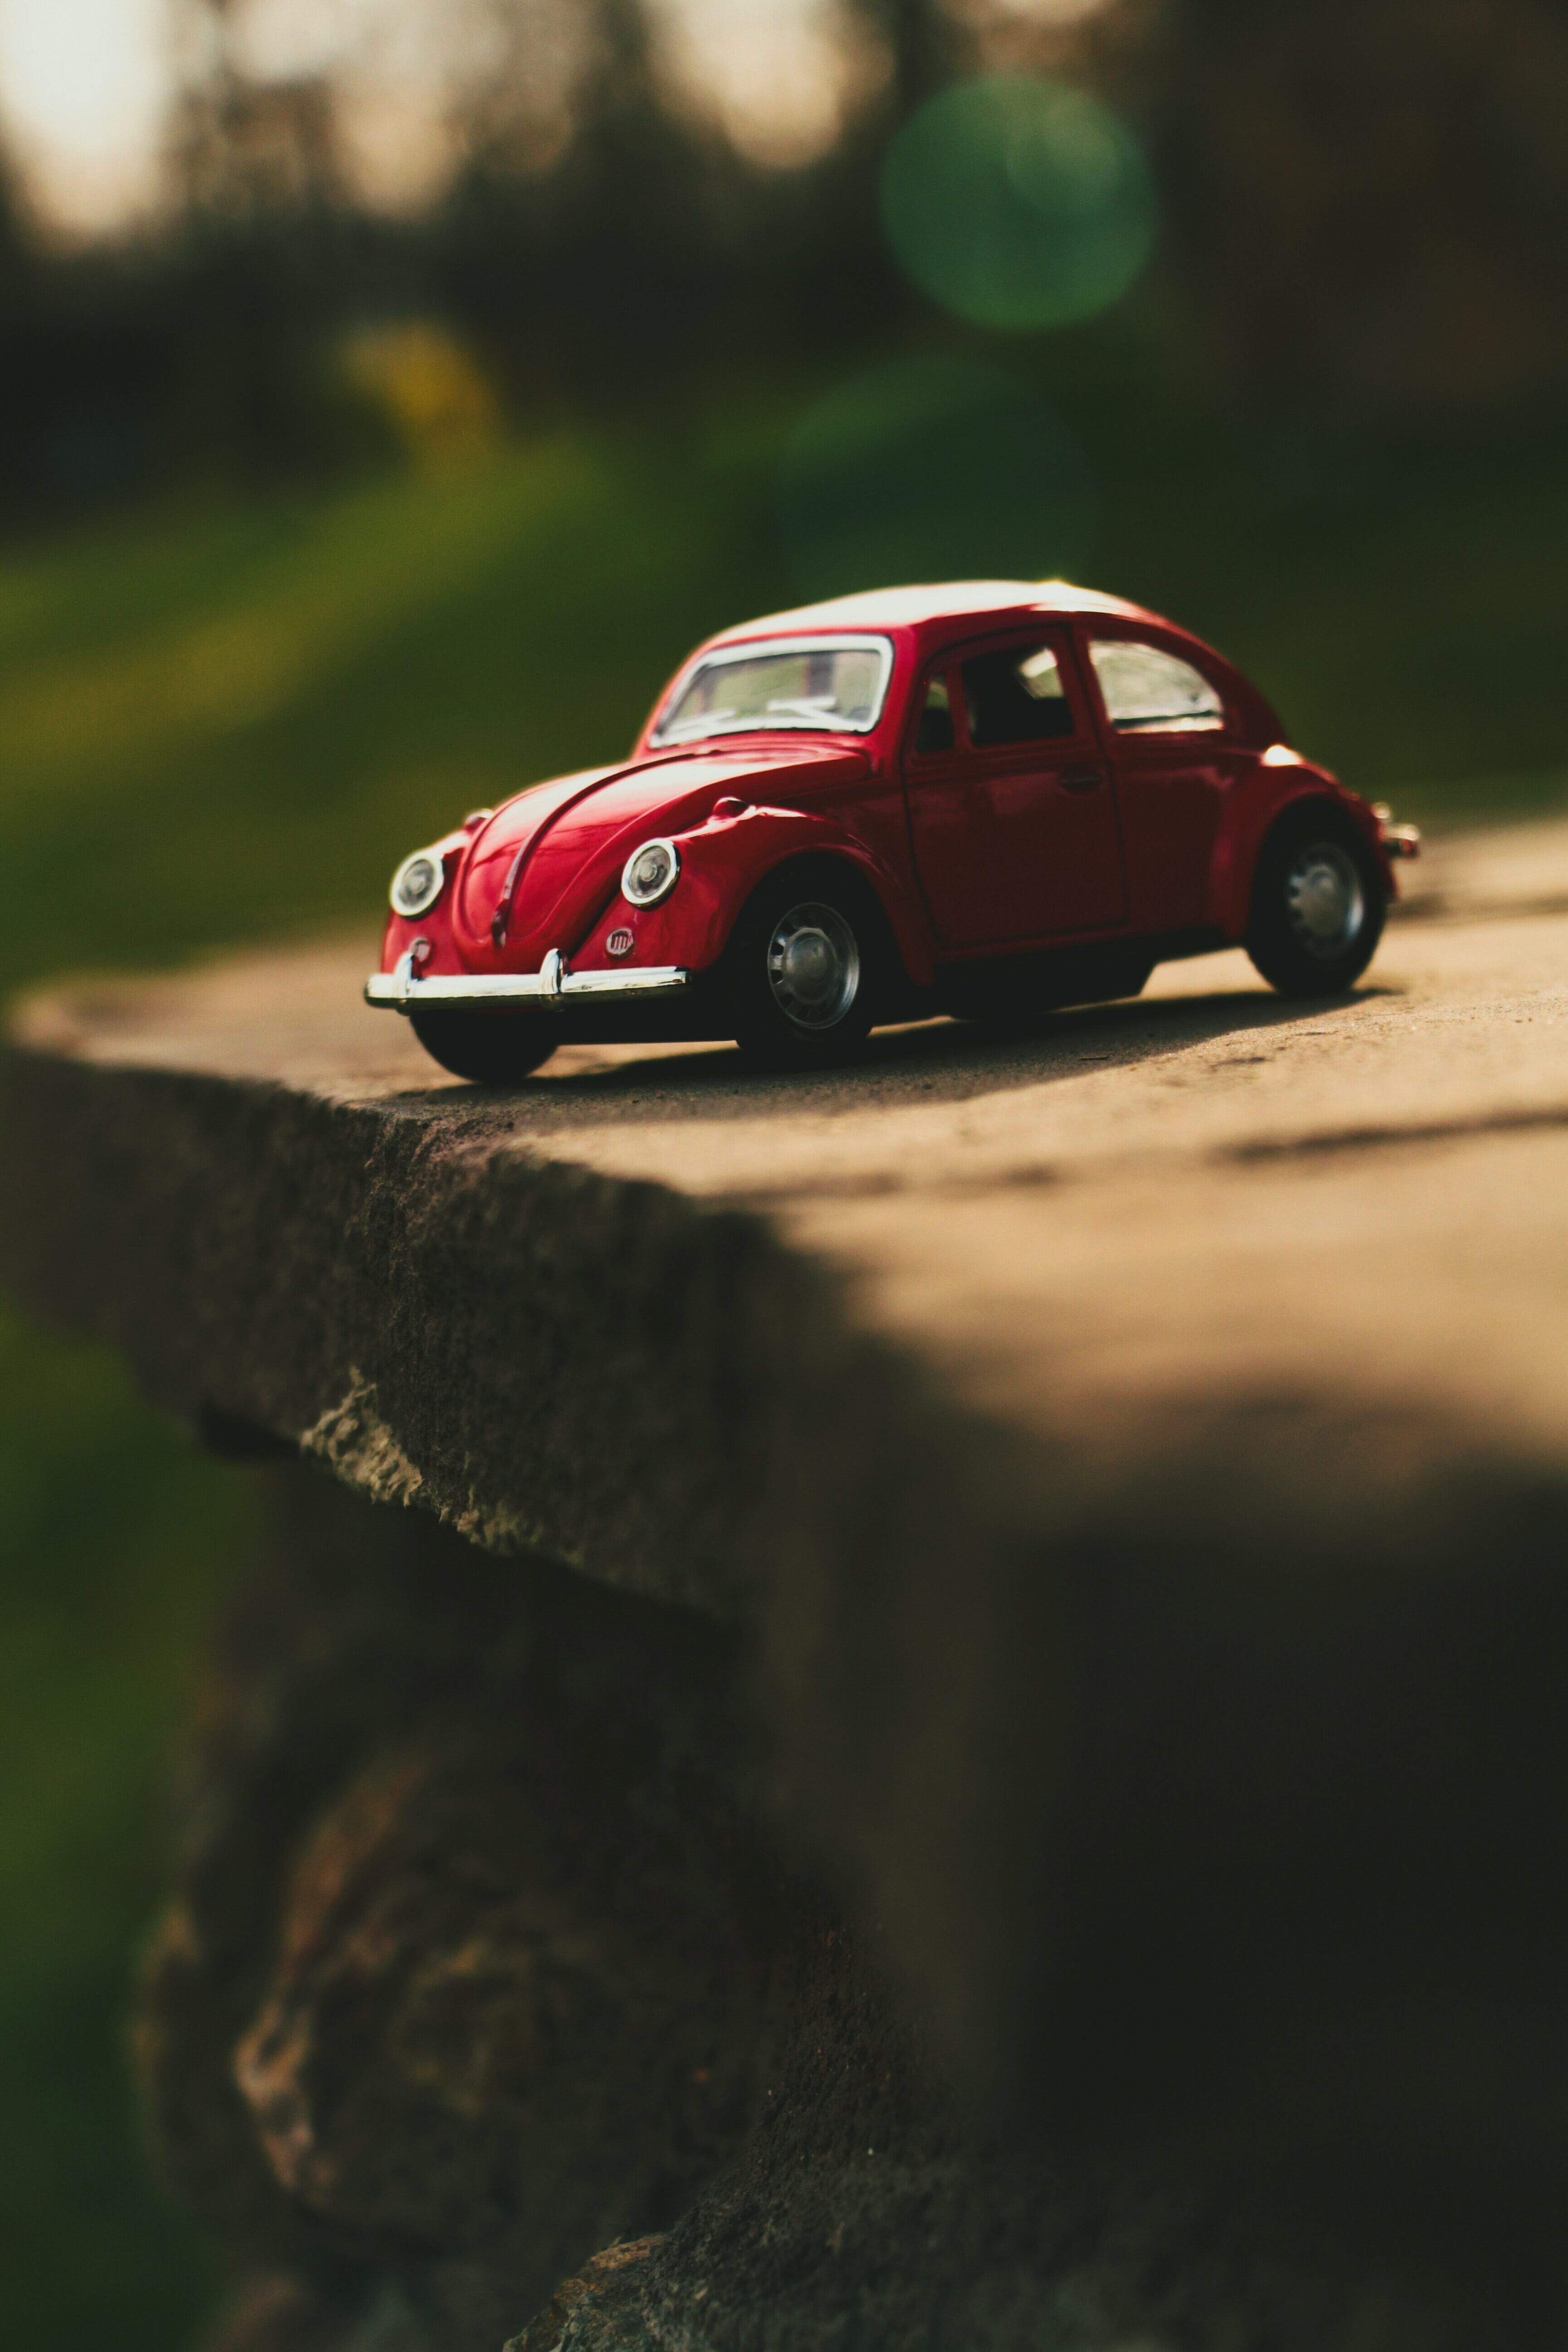 red Volkswagen Beetle scale model on grey concrete board